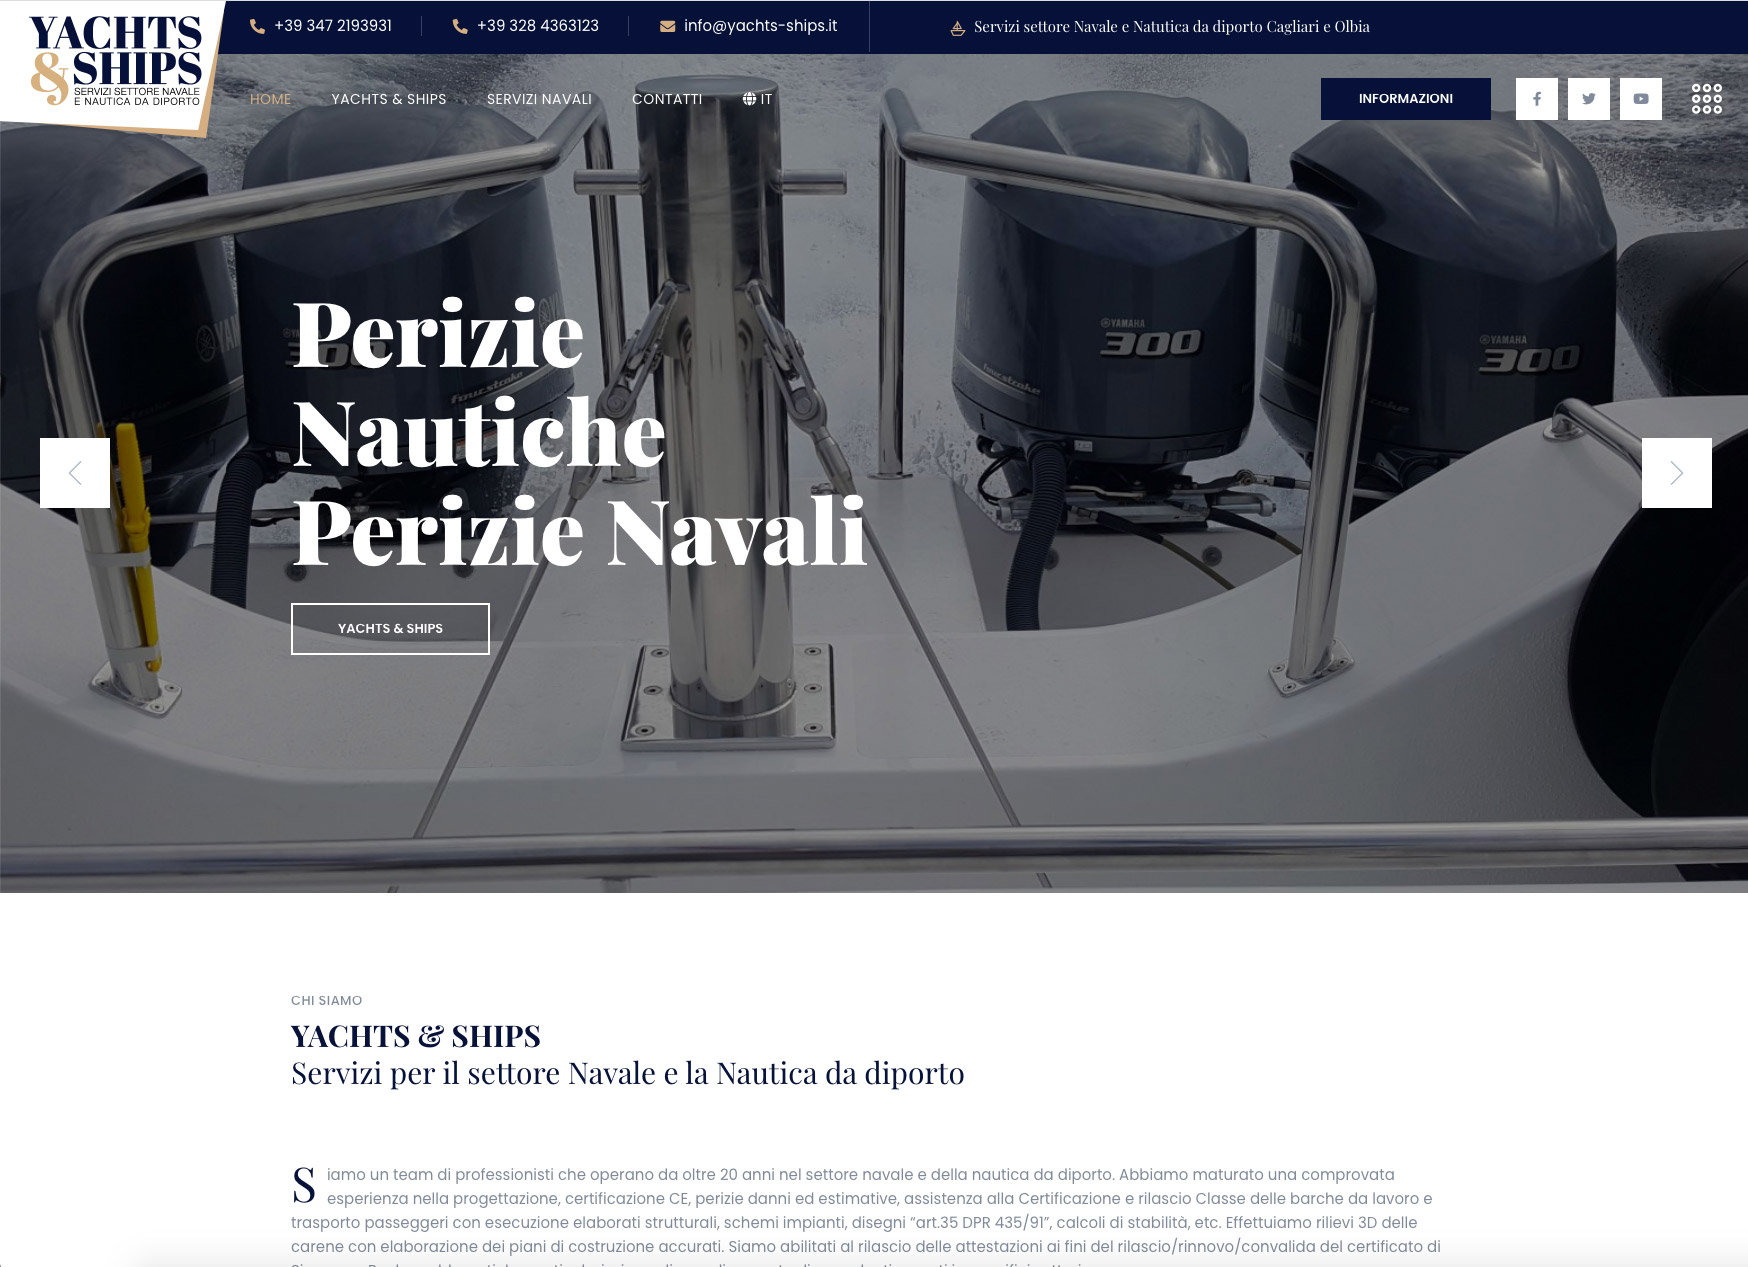 Realizzazione sito web responsive SG Consulting per Yachts and Ships